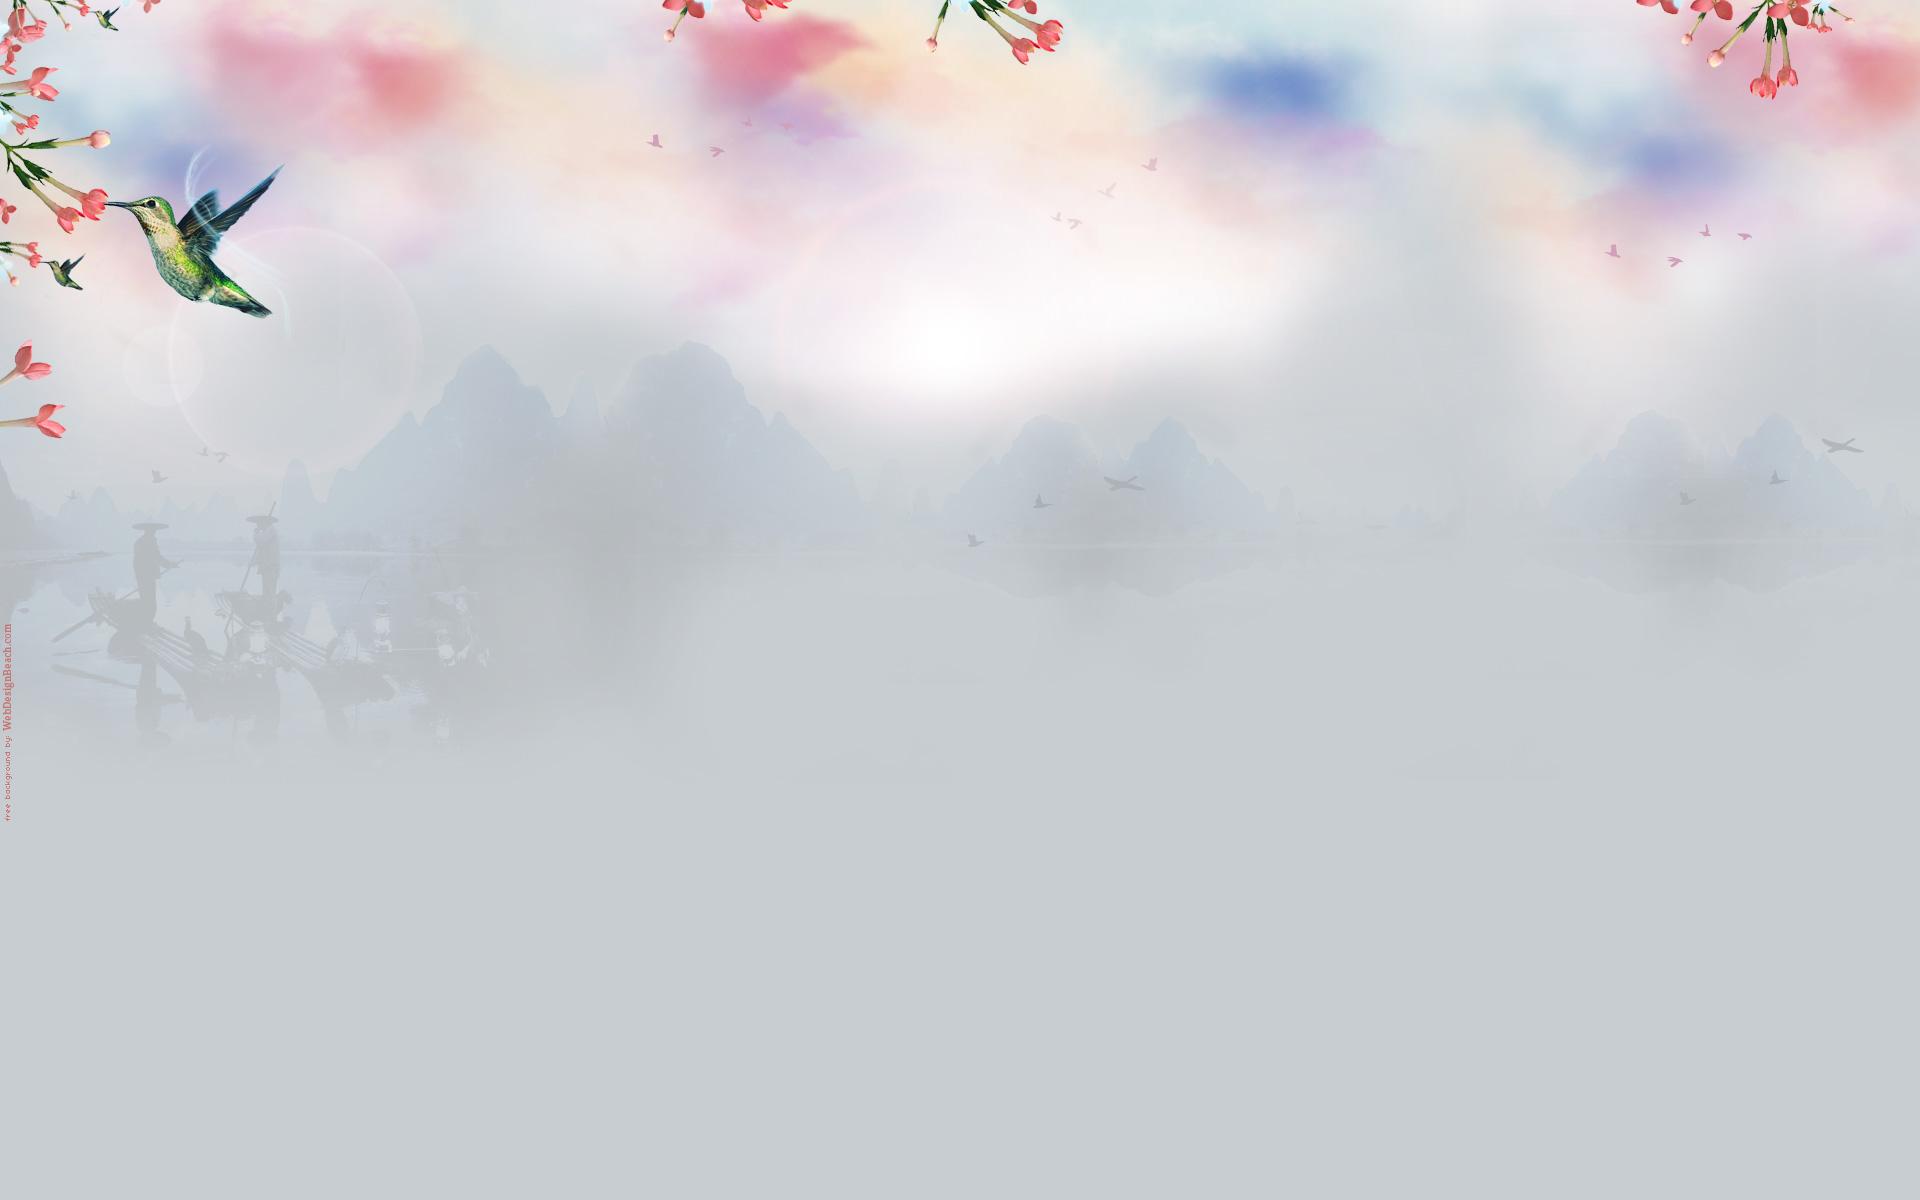 Hummingbird hd wallpaper background image 1920x1200 id 371033 wallpaper abyss - Wallpaper website ...